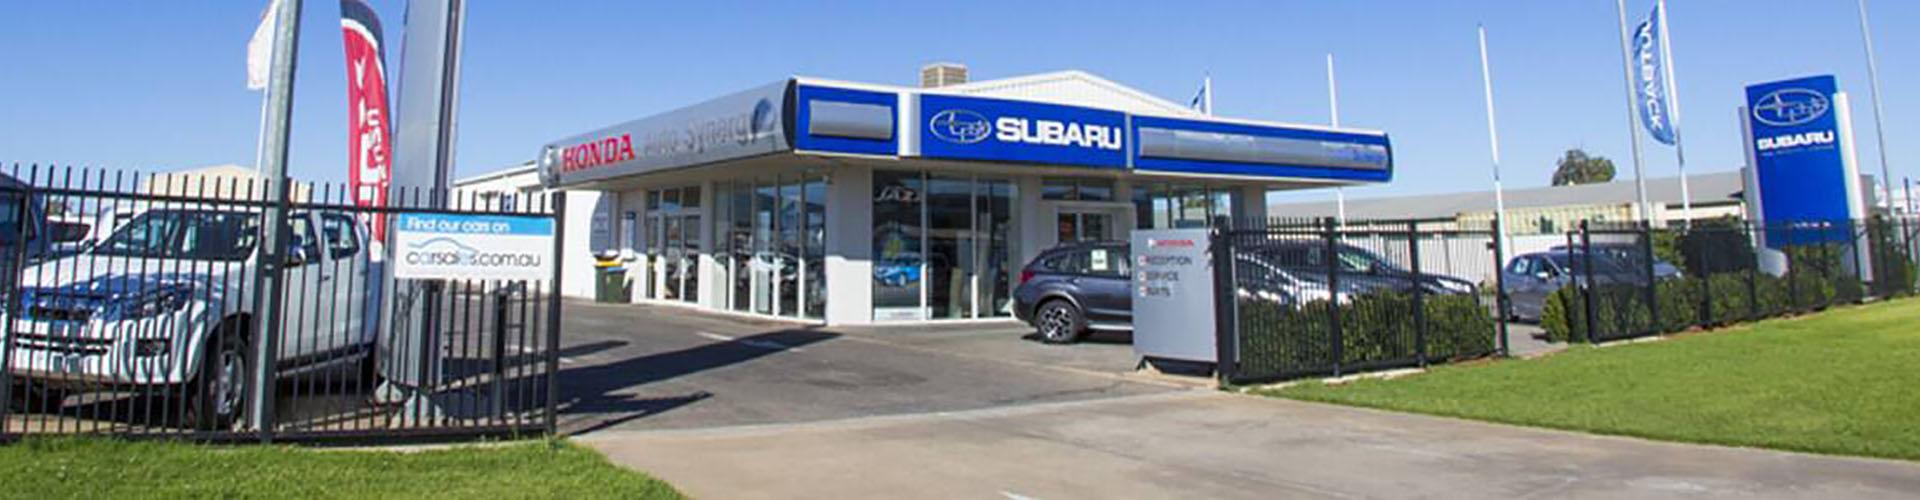 Autosynergy Subaru Contact Us